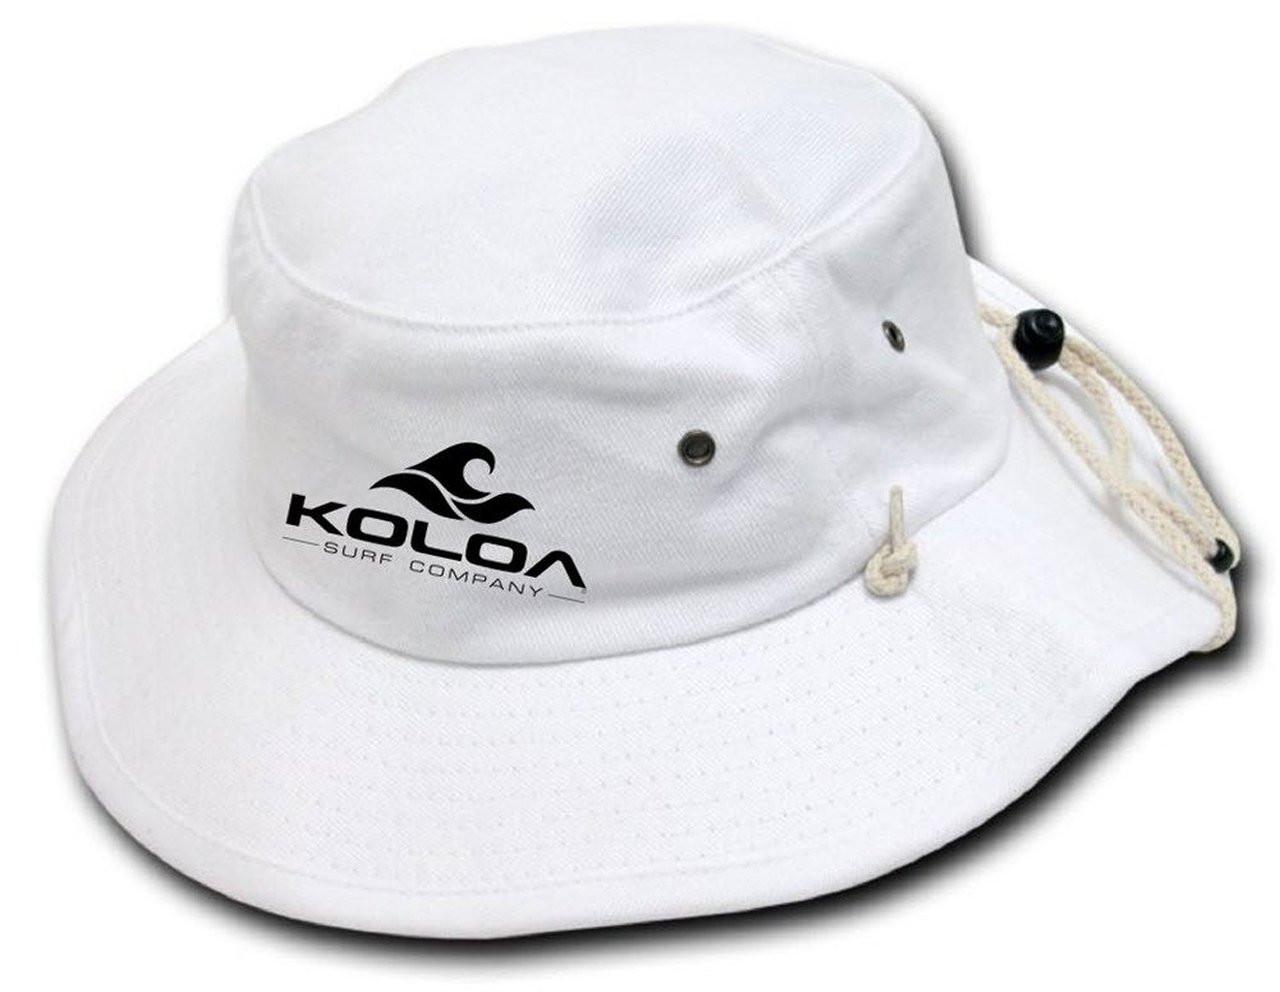 c6b71e259ec Koloa Surf Co. Aussie Style Outback Drawstring Adult Bucket Hat ...